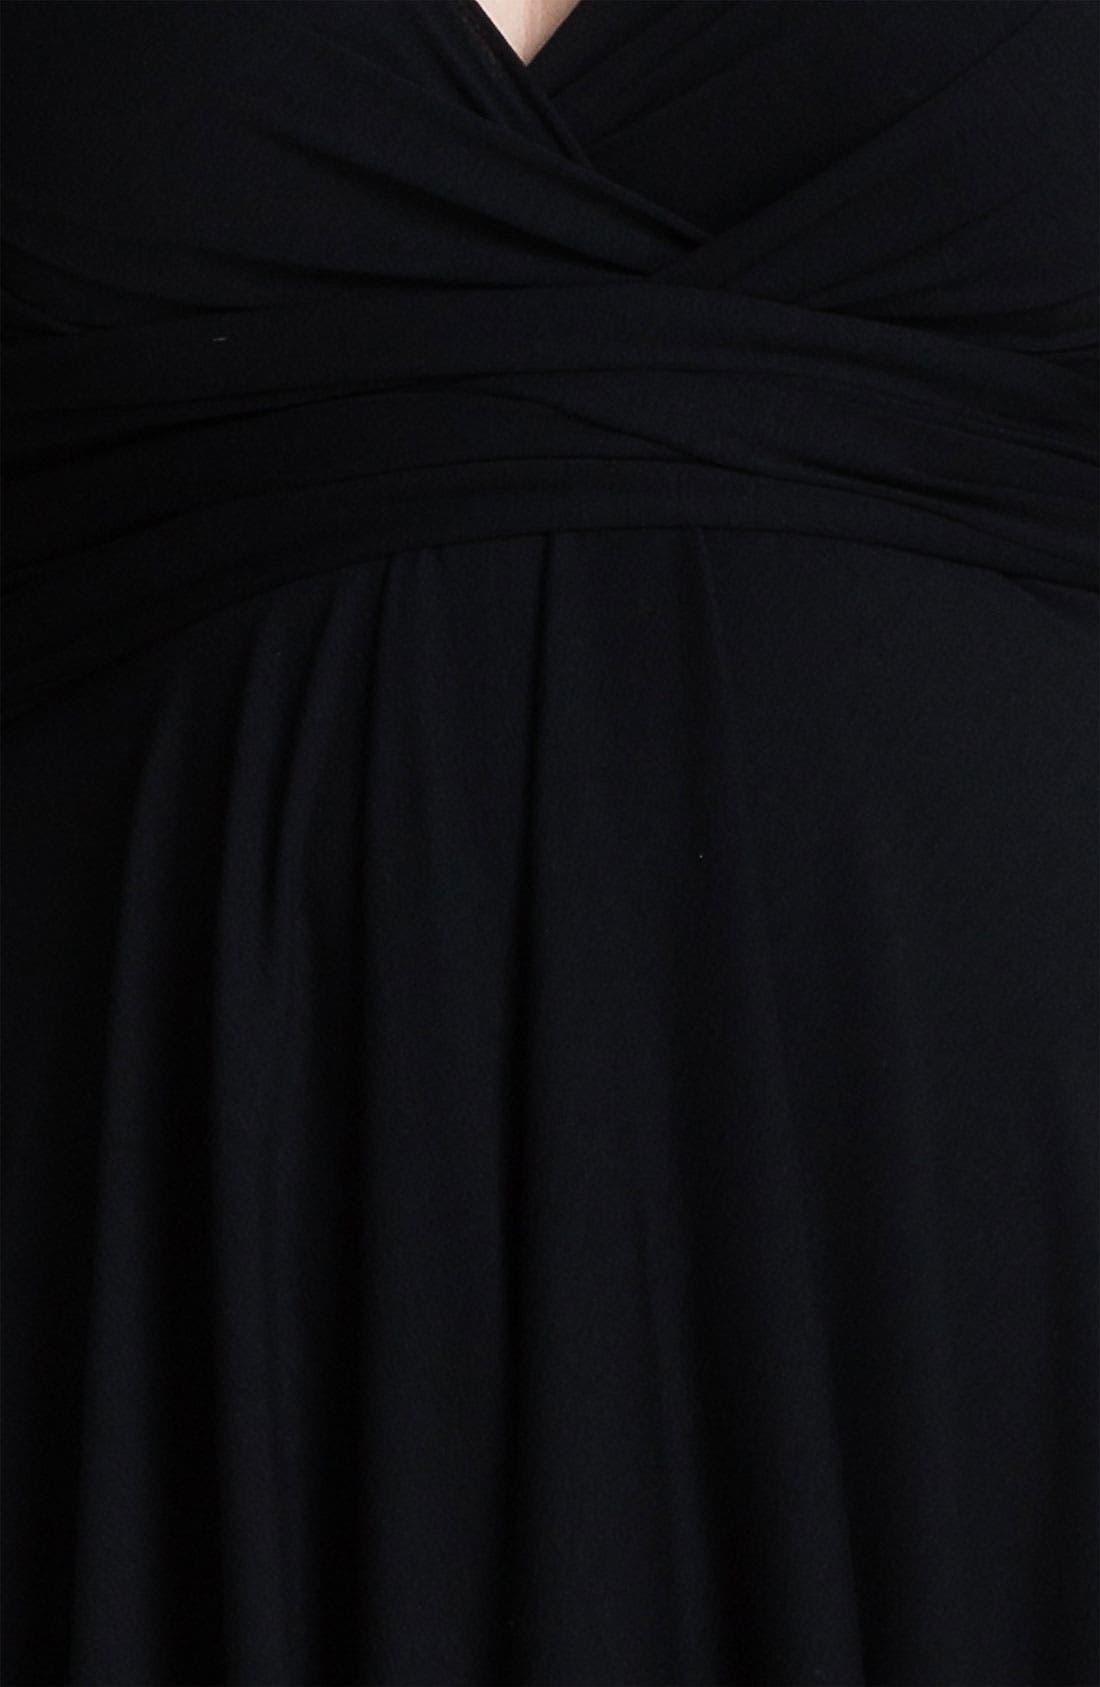 Alternate Image 3  - Monif C 'Marilyn' Convertible Jersey Dress (Plus)